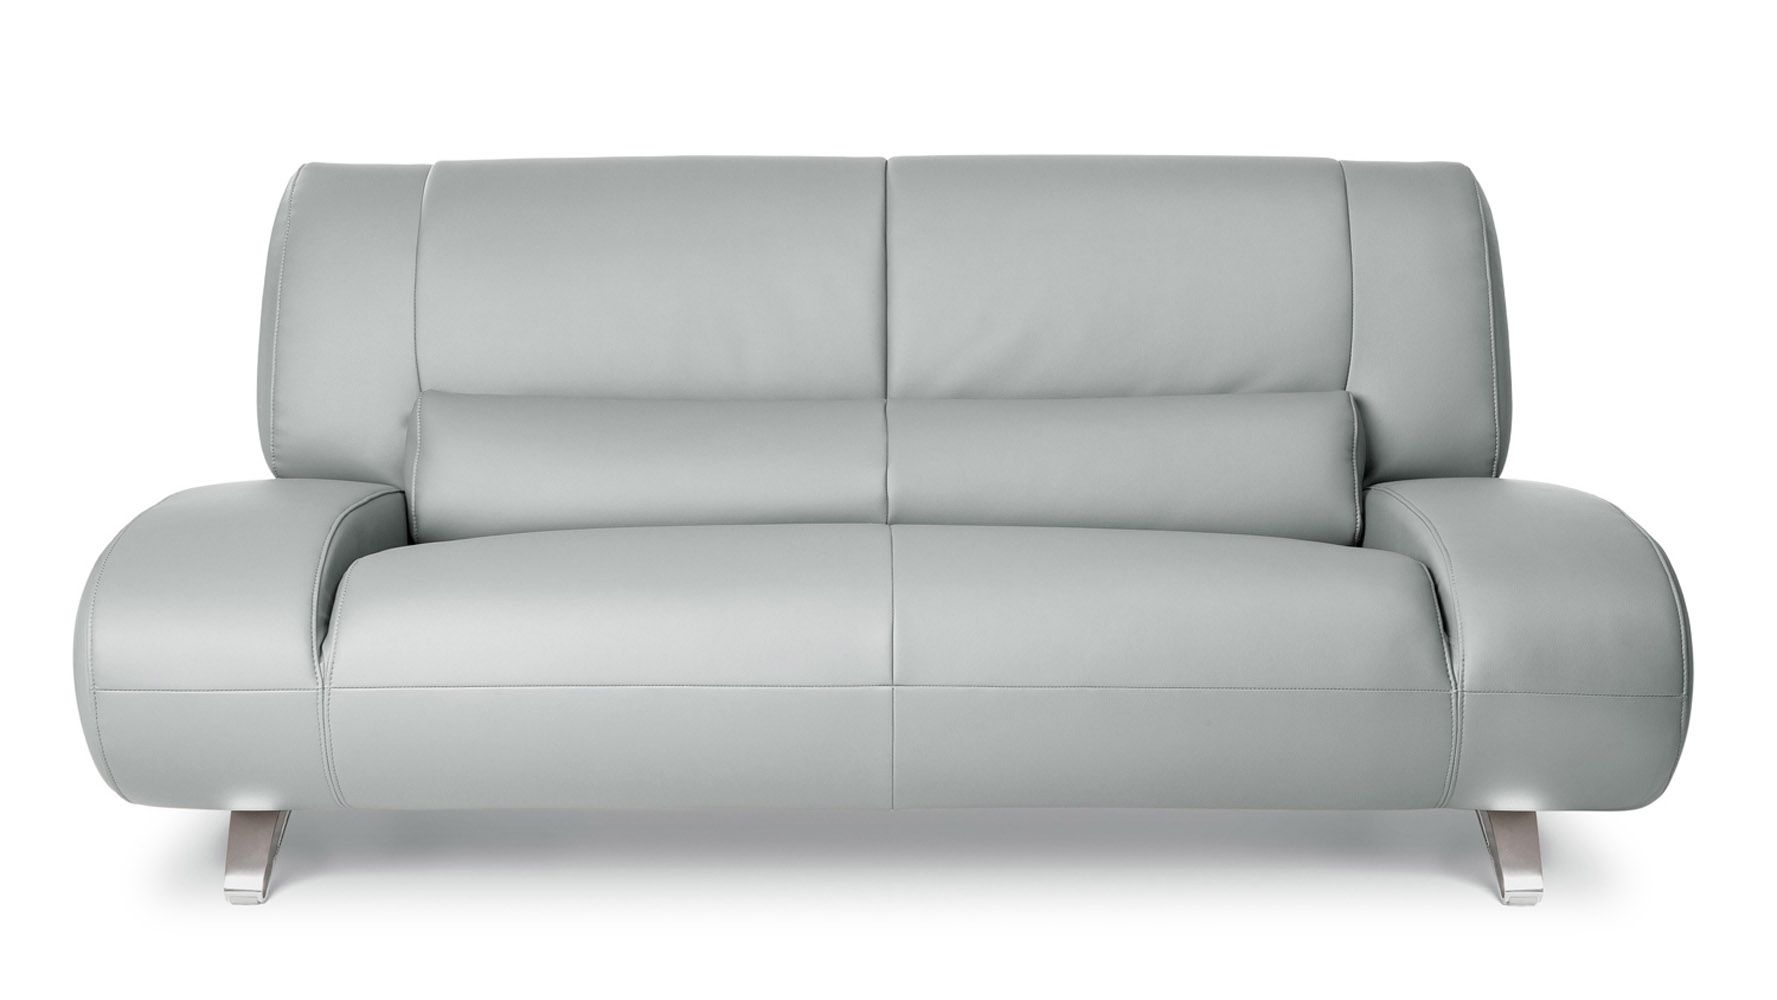 Aspen Loveseat | Leather Loveseat, Love Seat, Types Of Sofas Regarding Aspen Leather Sofas (View 2 of 15)